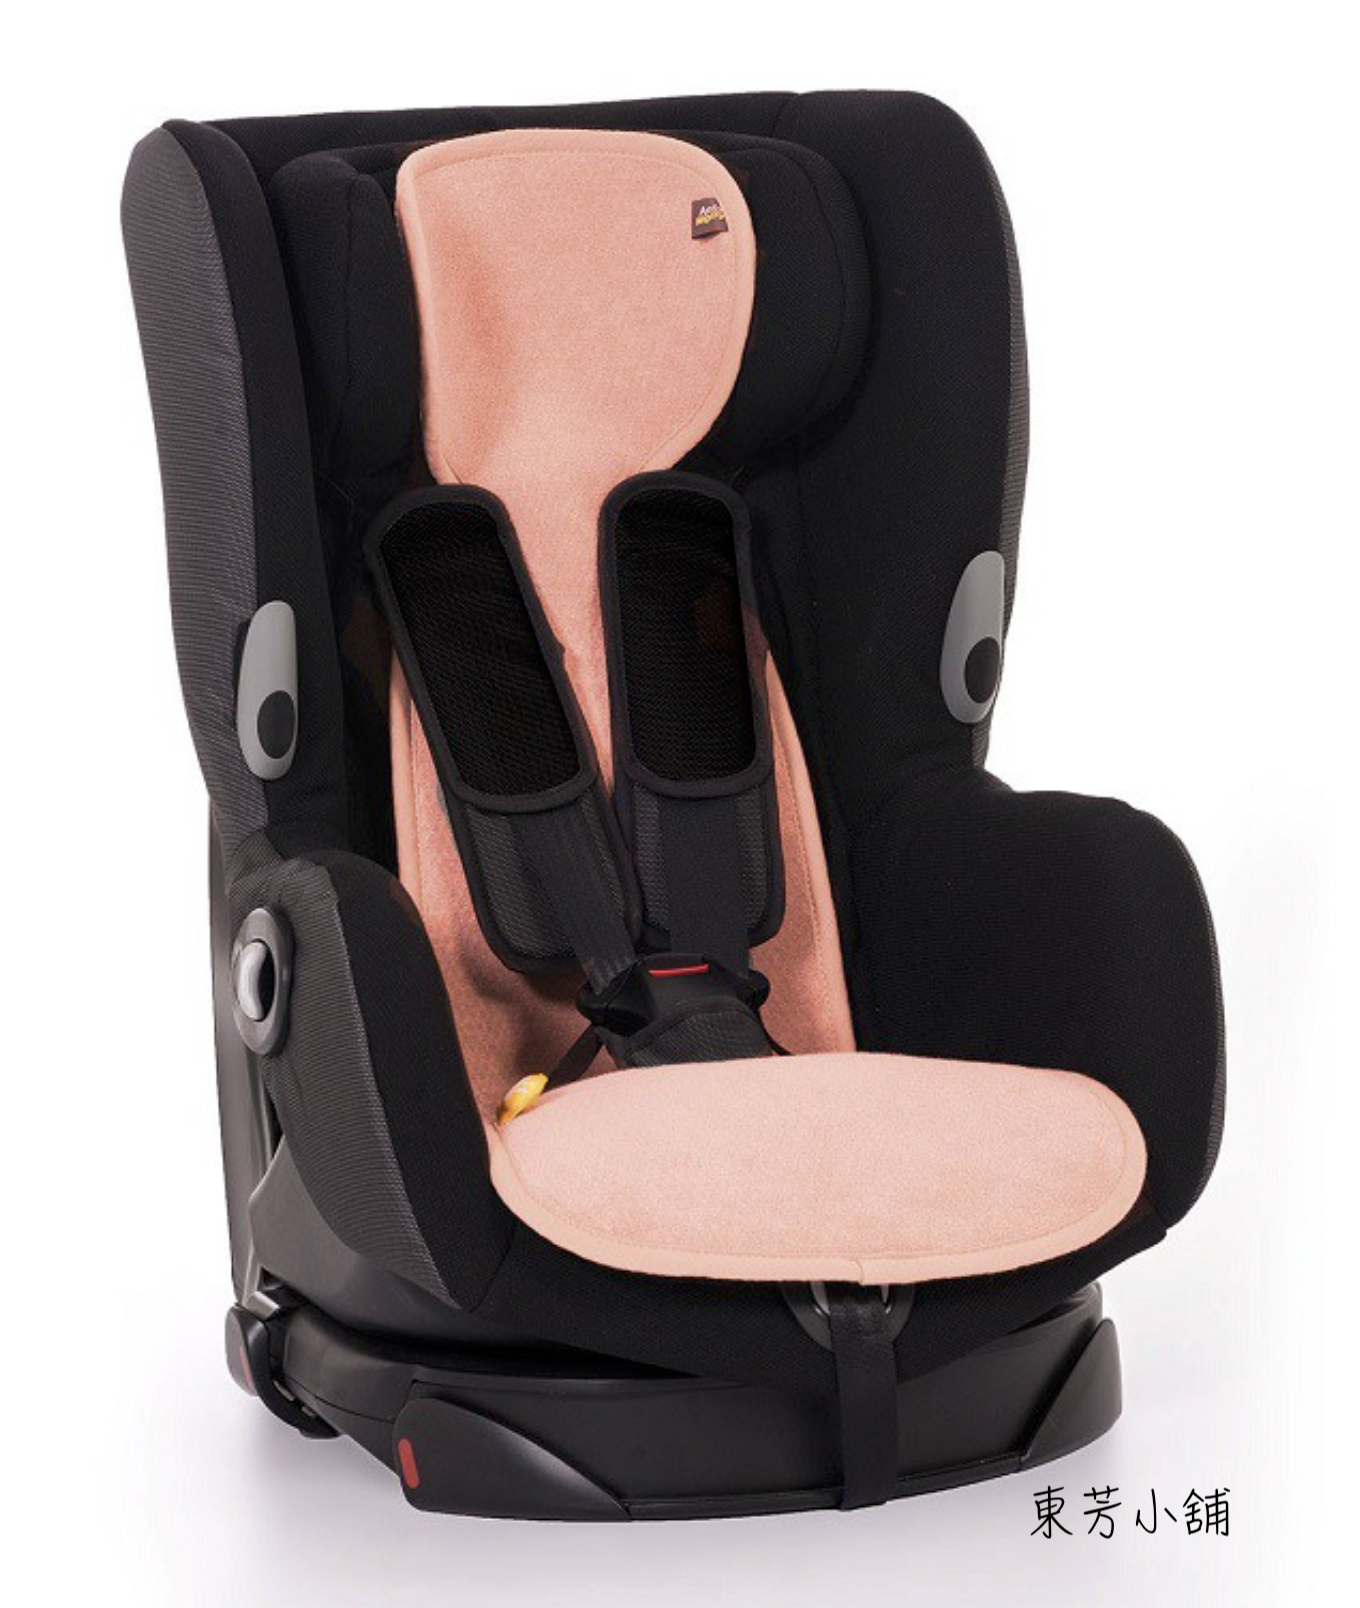 Aeromoov - 3D科技 嬰幼兒汽座透氣墊 (有機棉表層+立體透氣底布)(炭棕色/薄荷綠/火鶴紅)